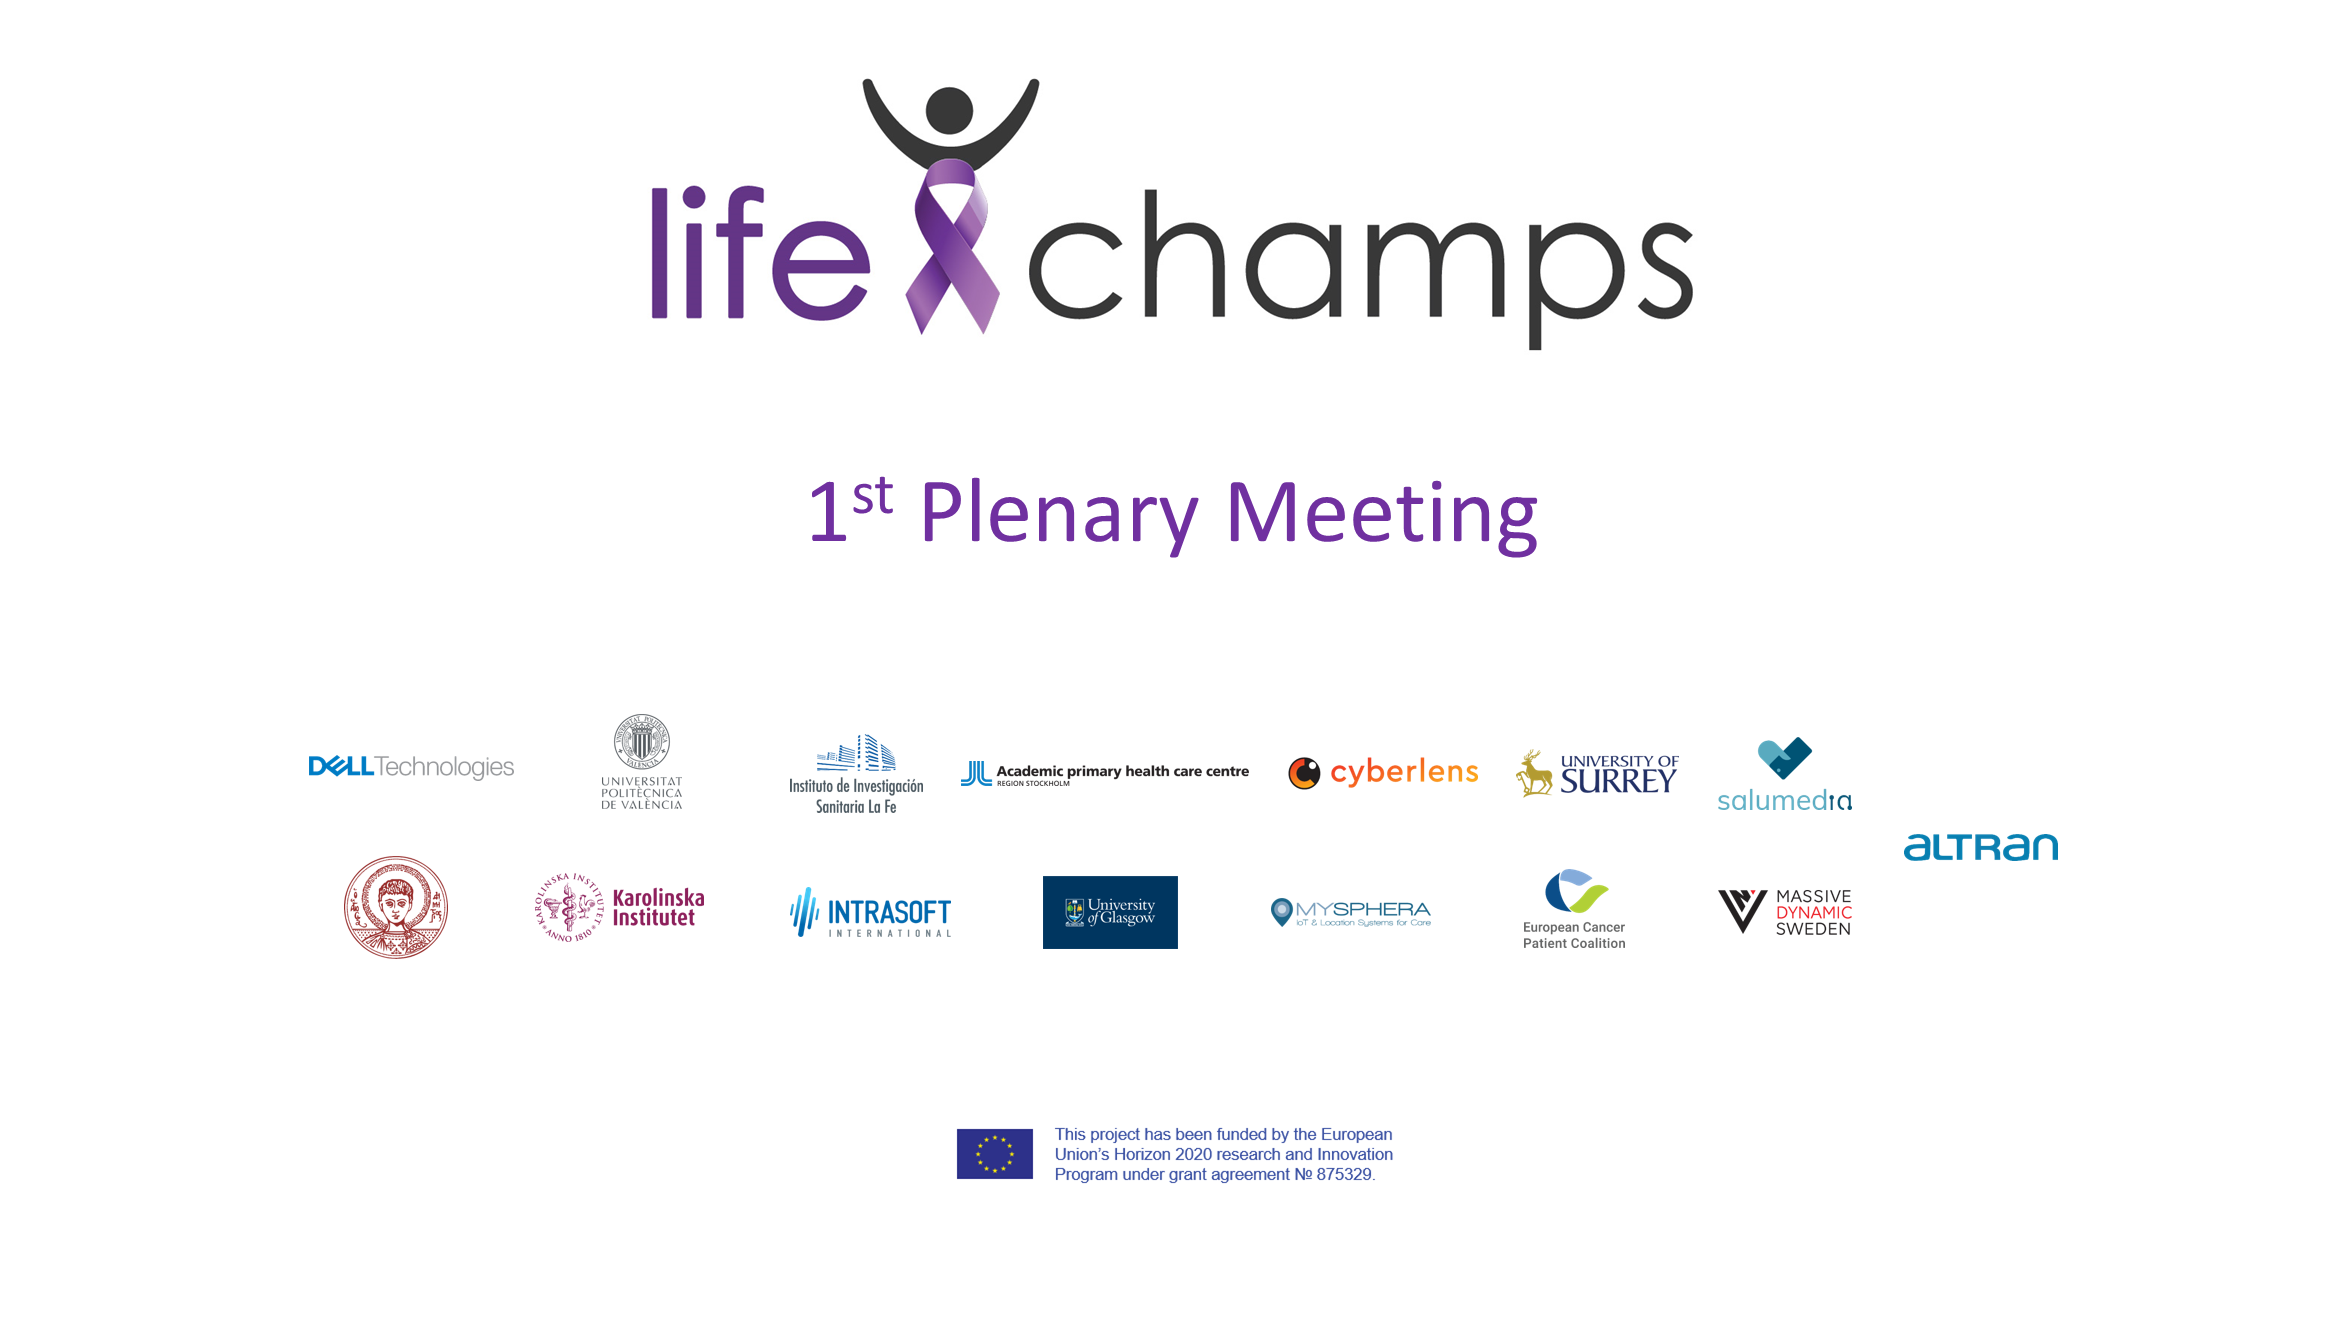 LifeChamps 1st Plenary Meeting